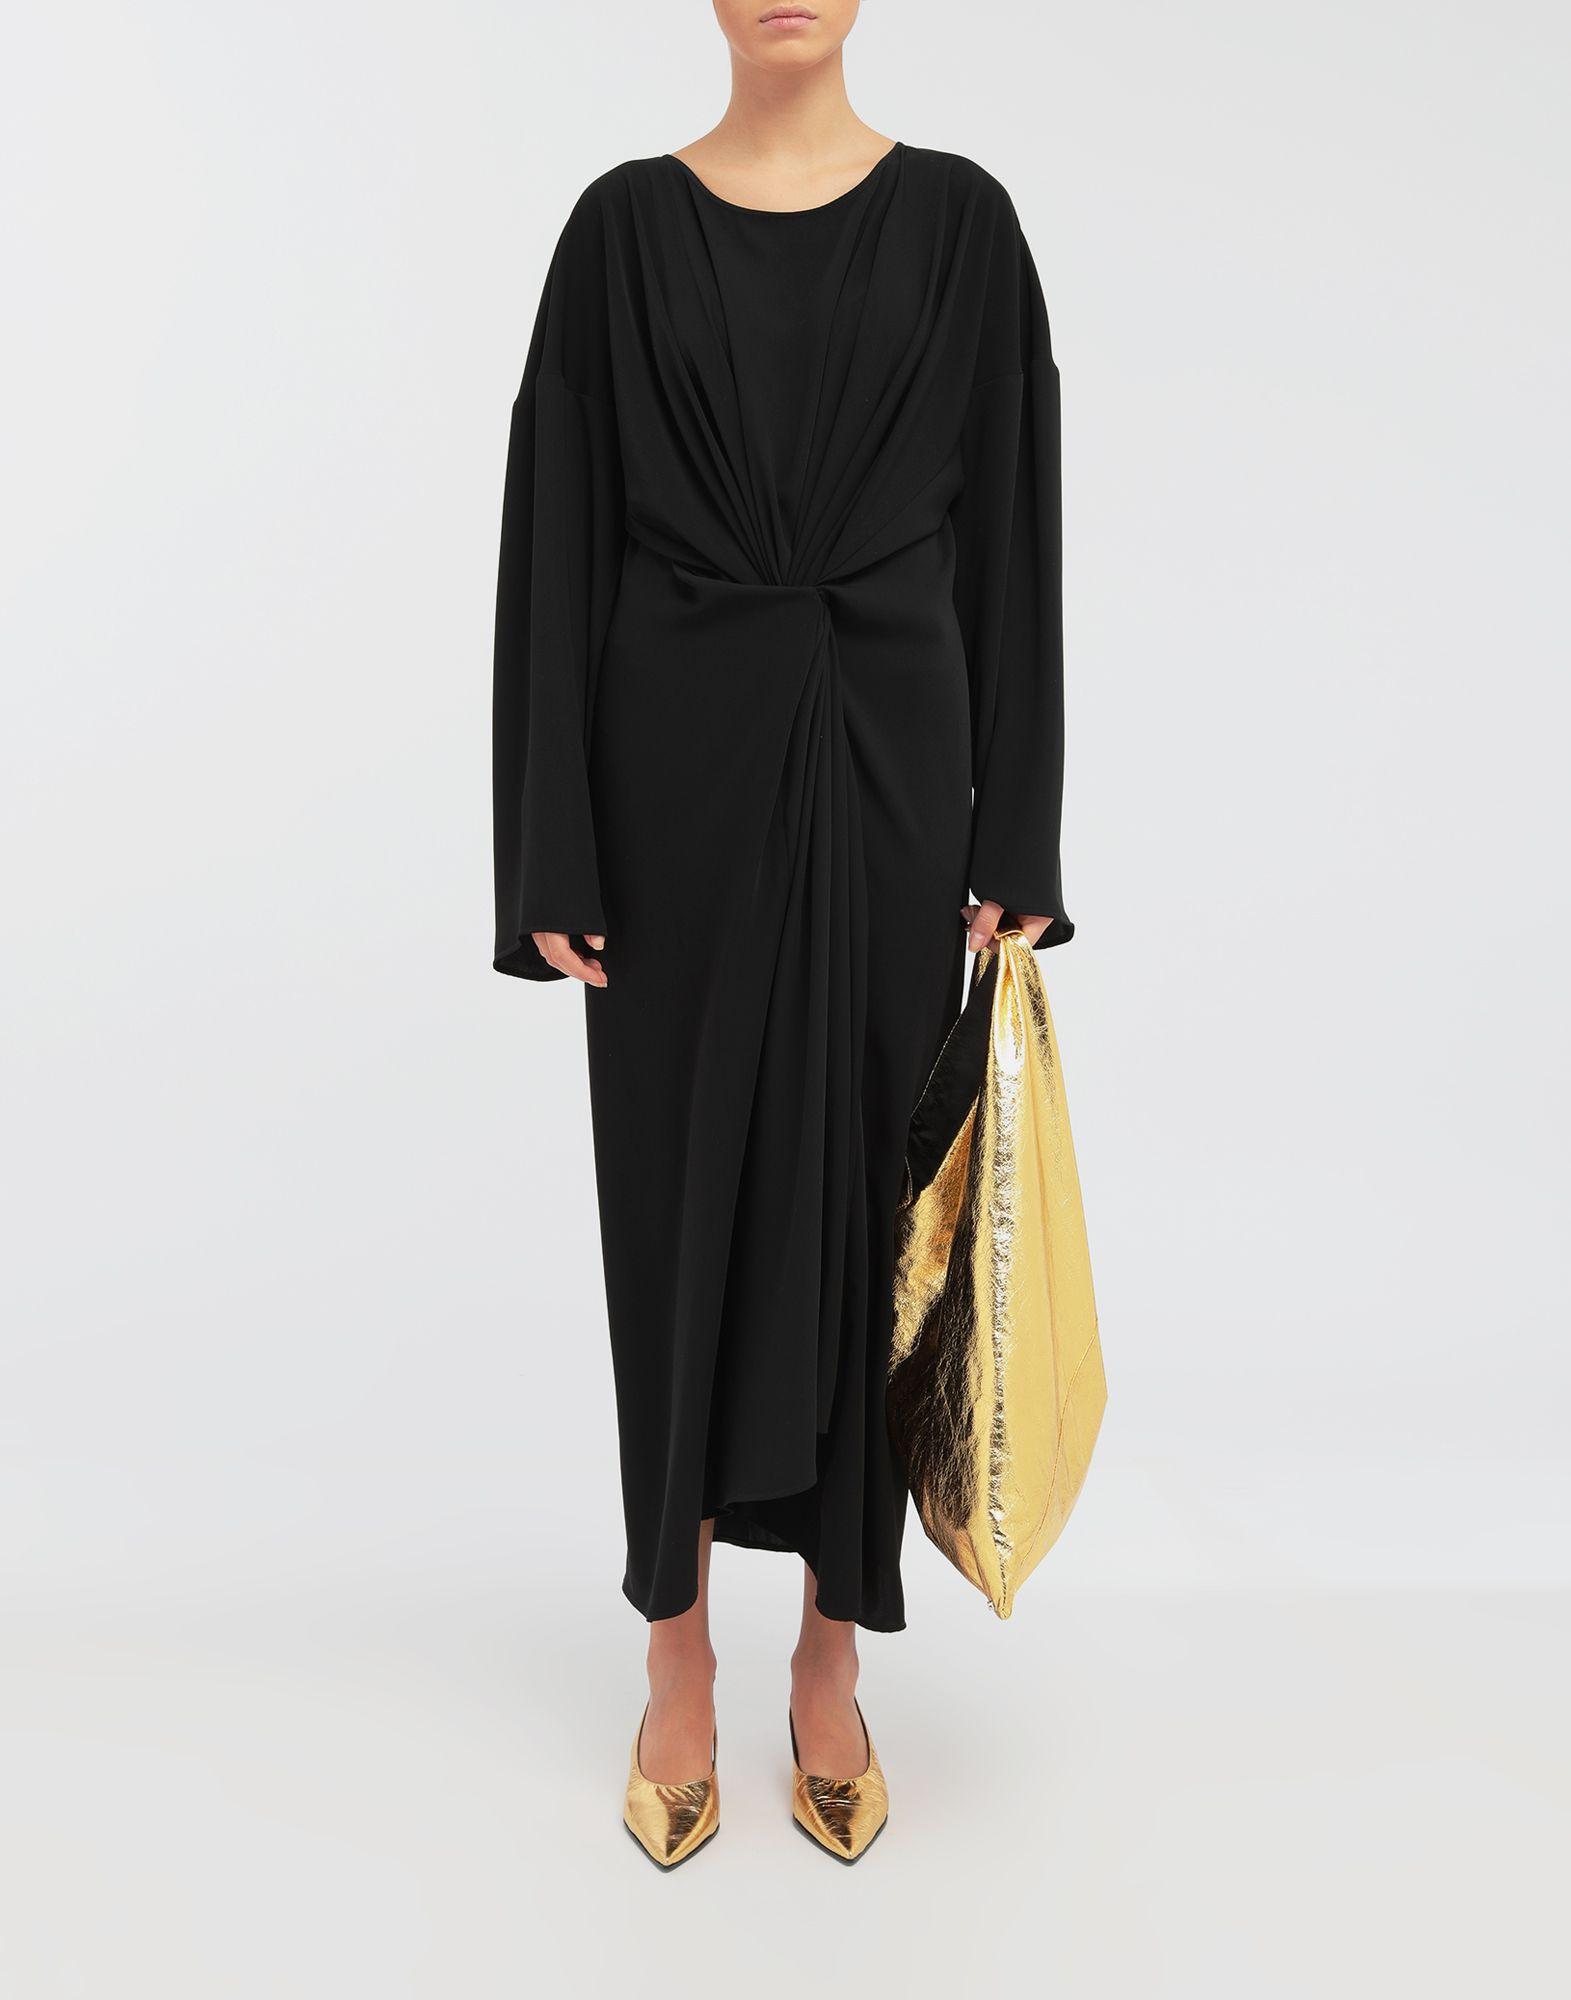 MM6 MAISON MARGIELA Draped maxi dress Long dress Woman d